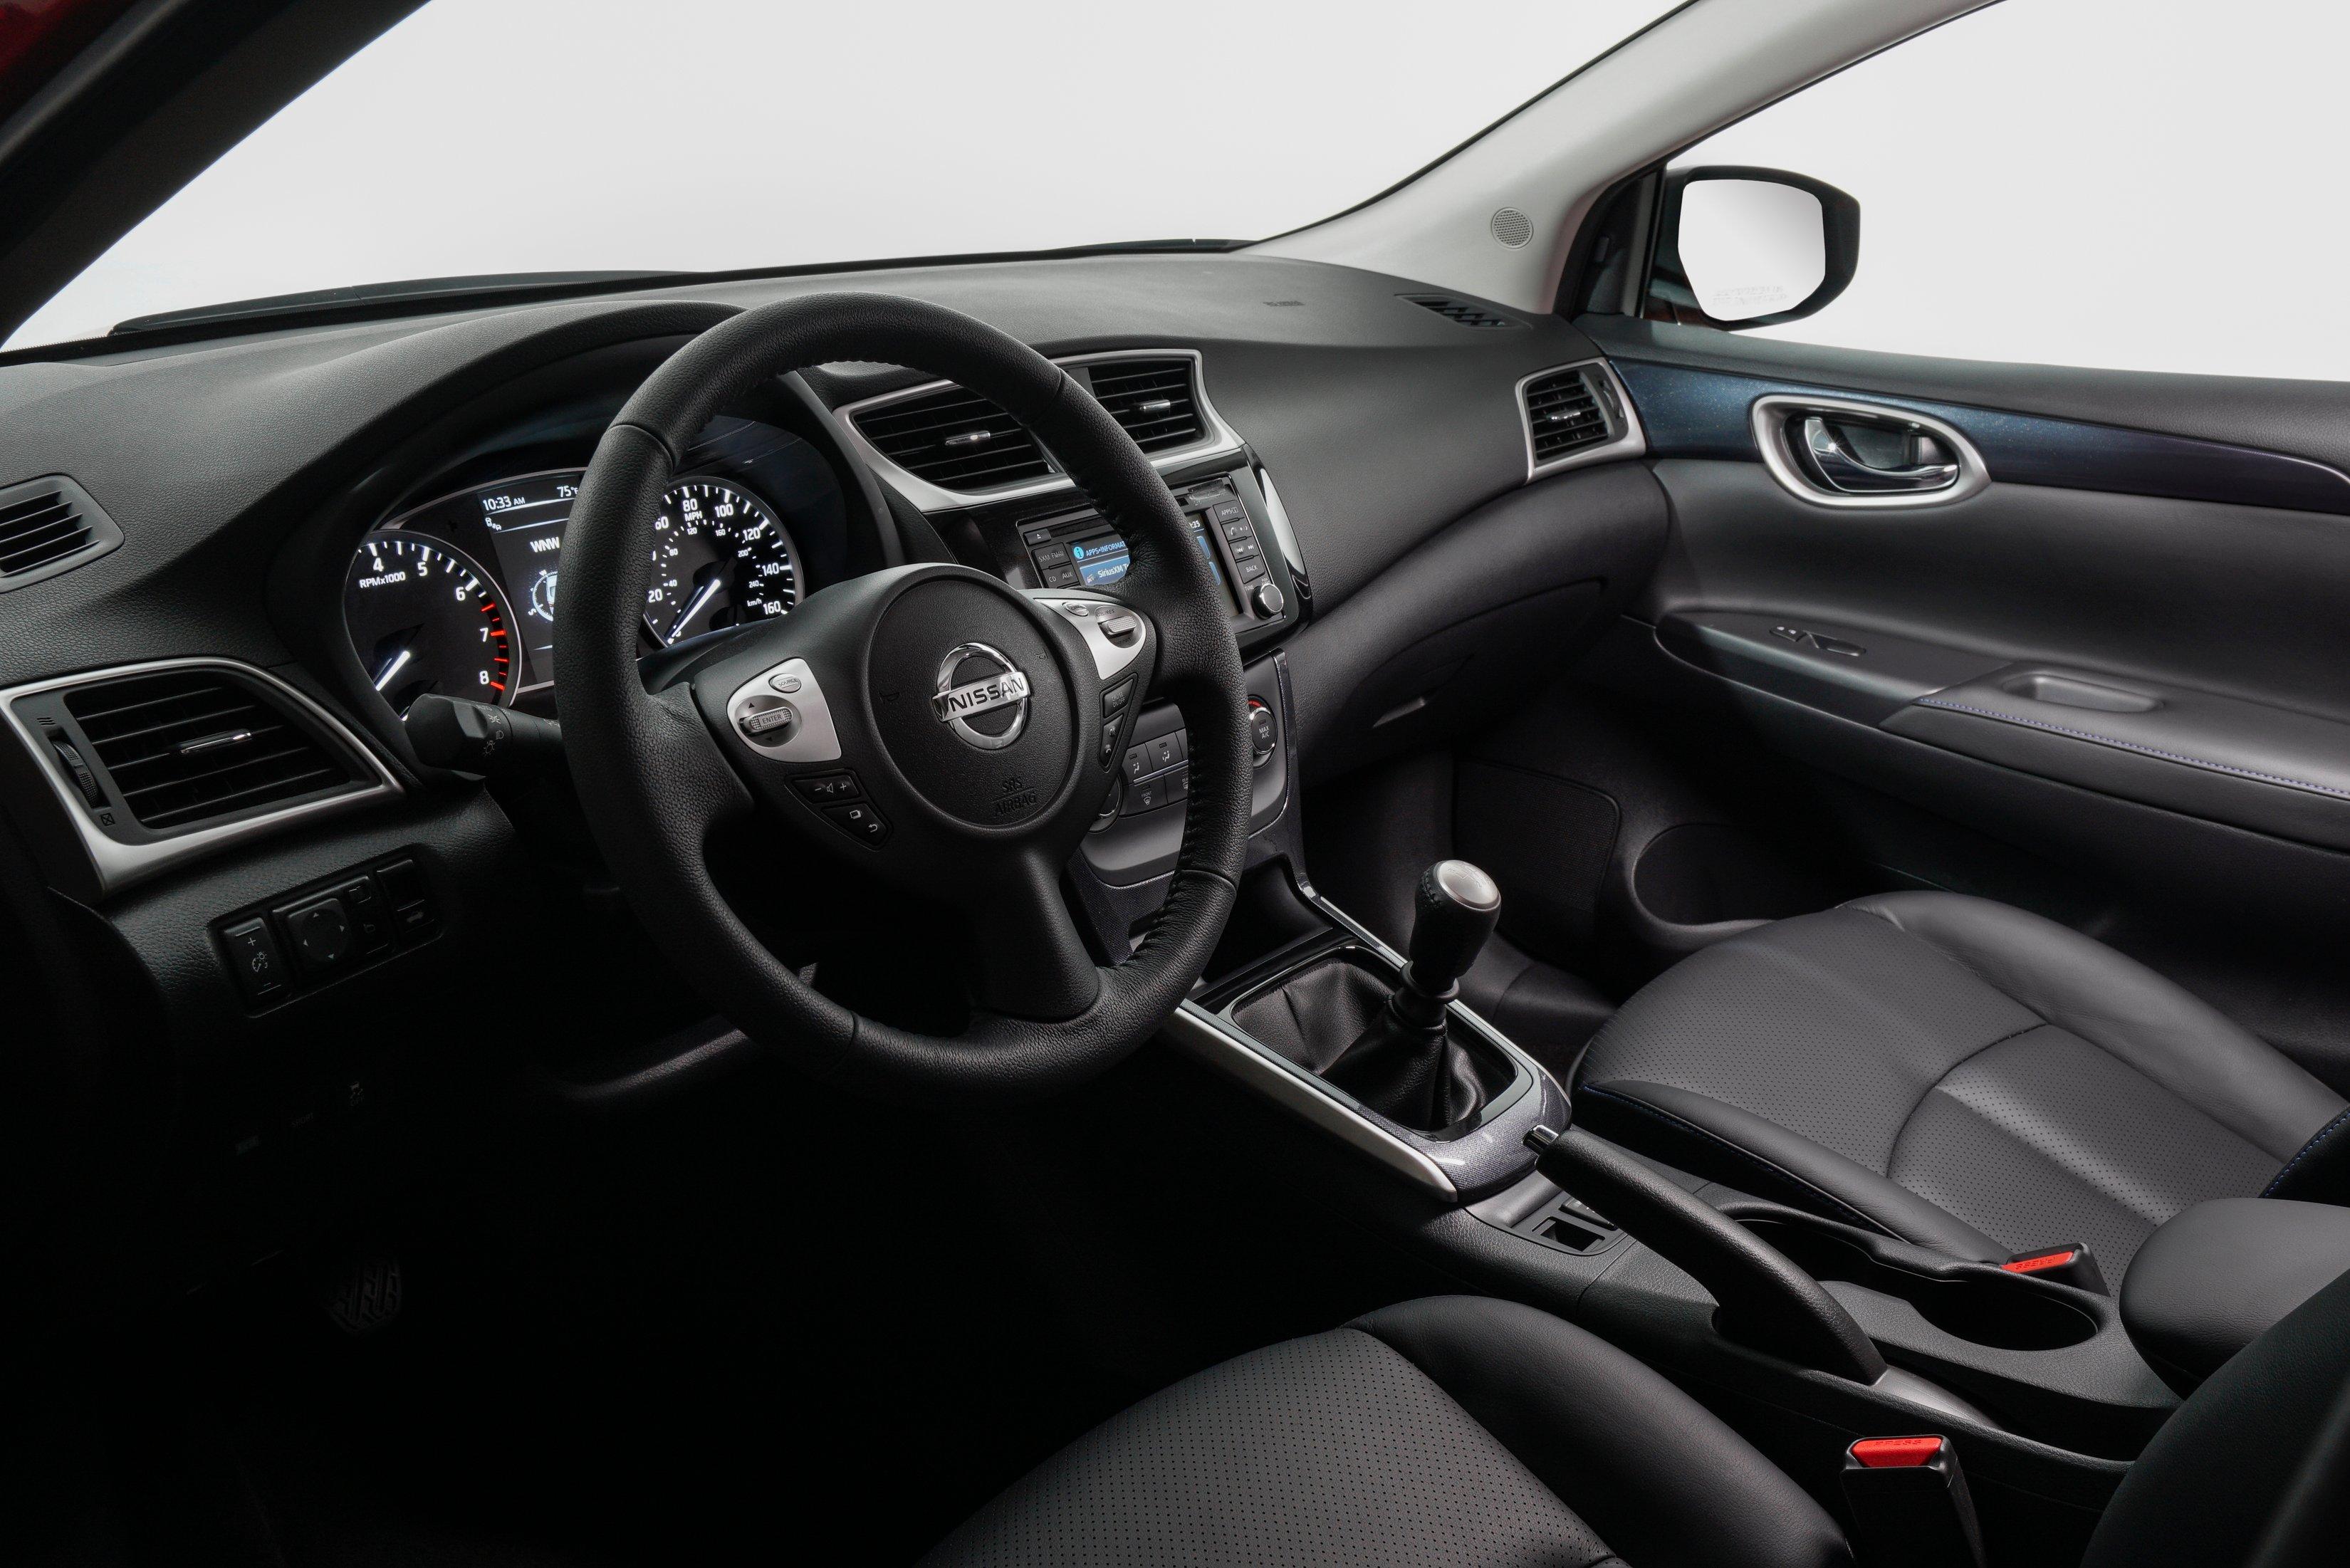 Nissan Almera Nismo Reviewnissan 1 5 E At 2018 Philippines Black 2017 Sentra Sr Turbo 6l Dig T 188 Hp 6mt Paul